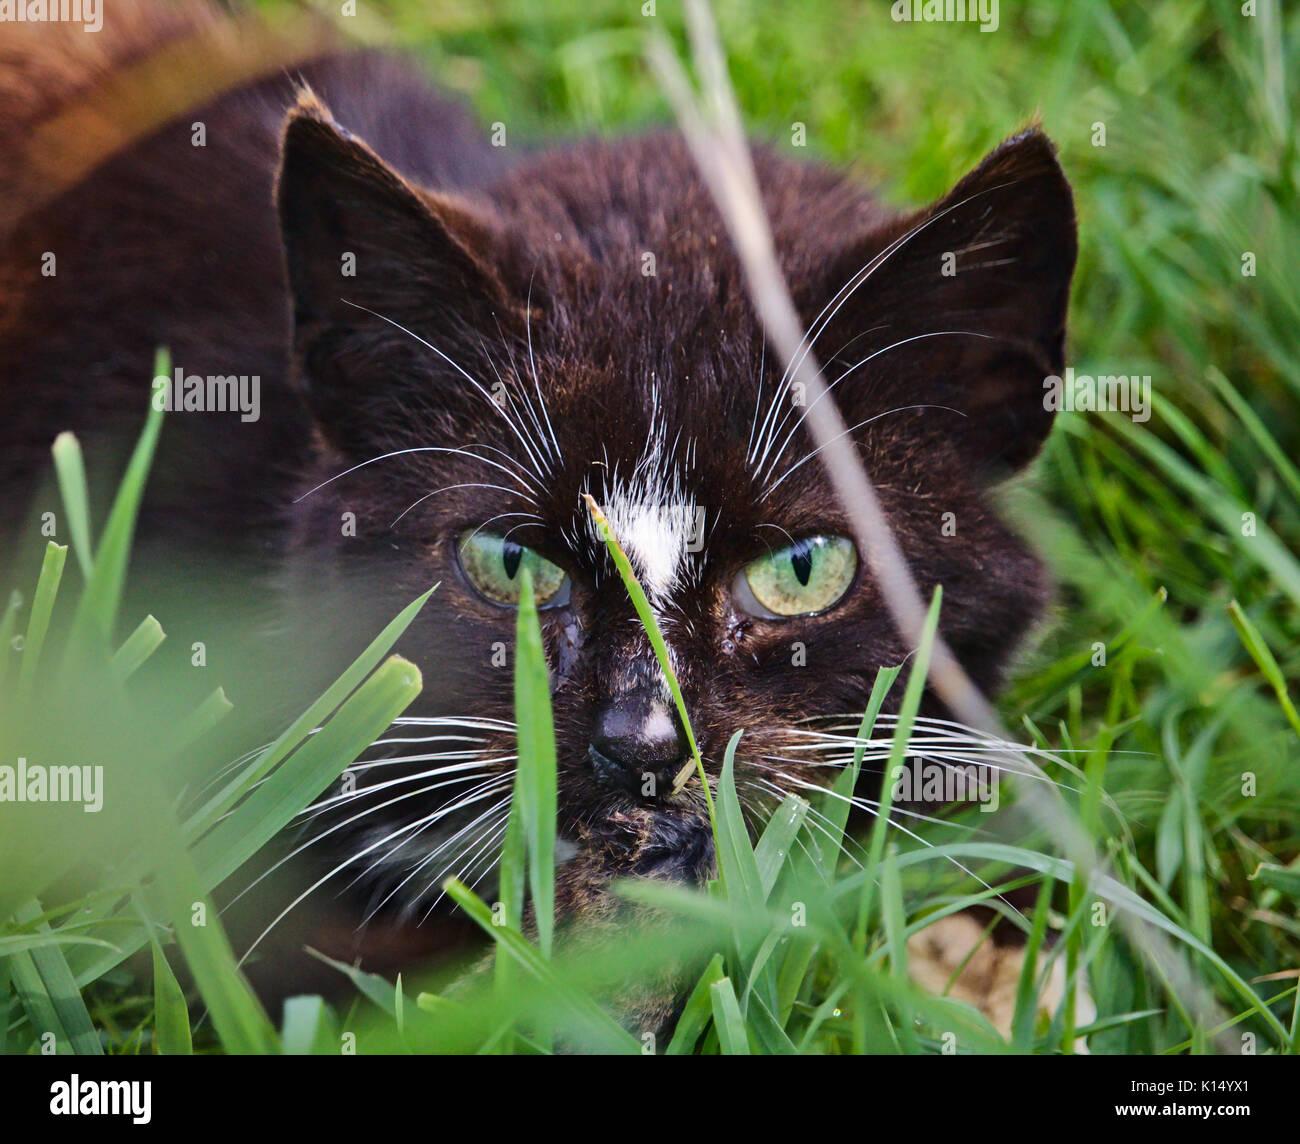 Cat with intense predator eyes hidden in the grass - Stock Image